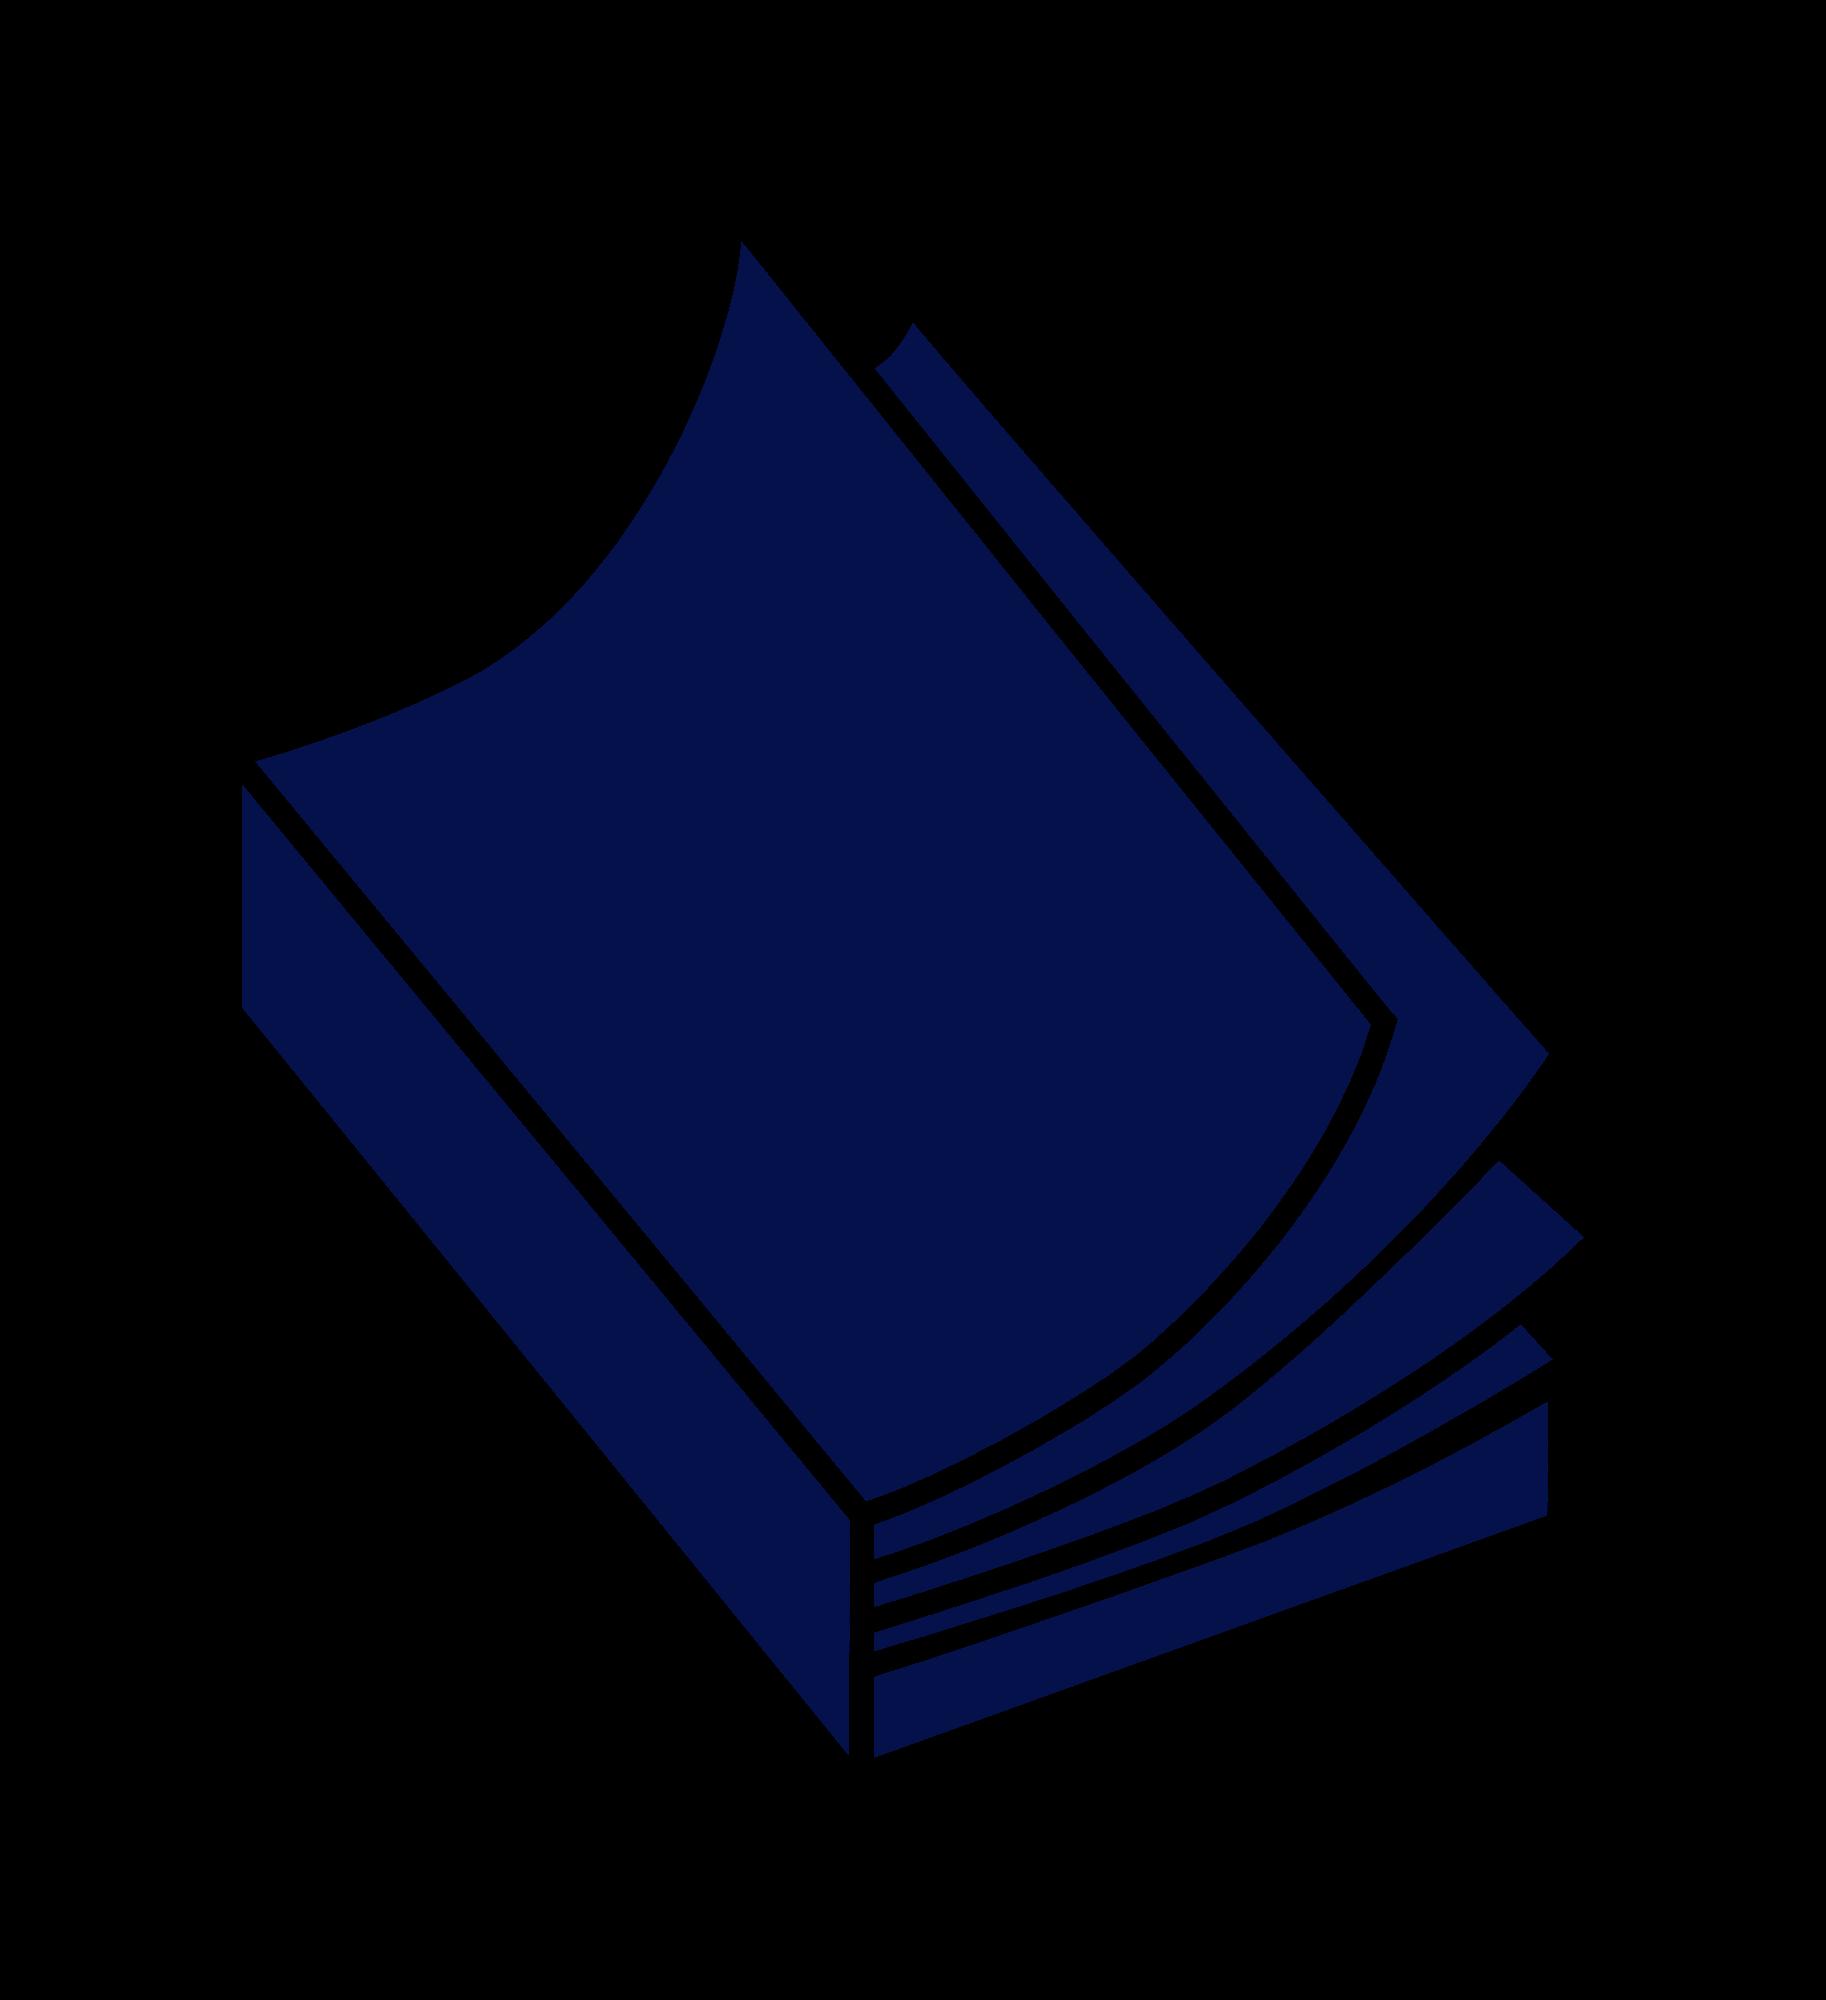 Publications_files/shapeimage_1.jpg